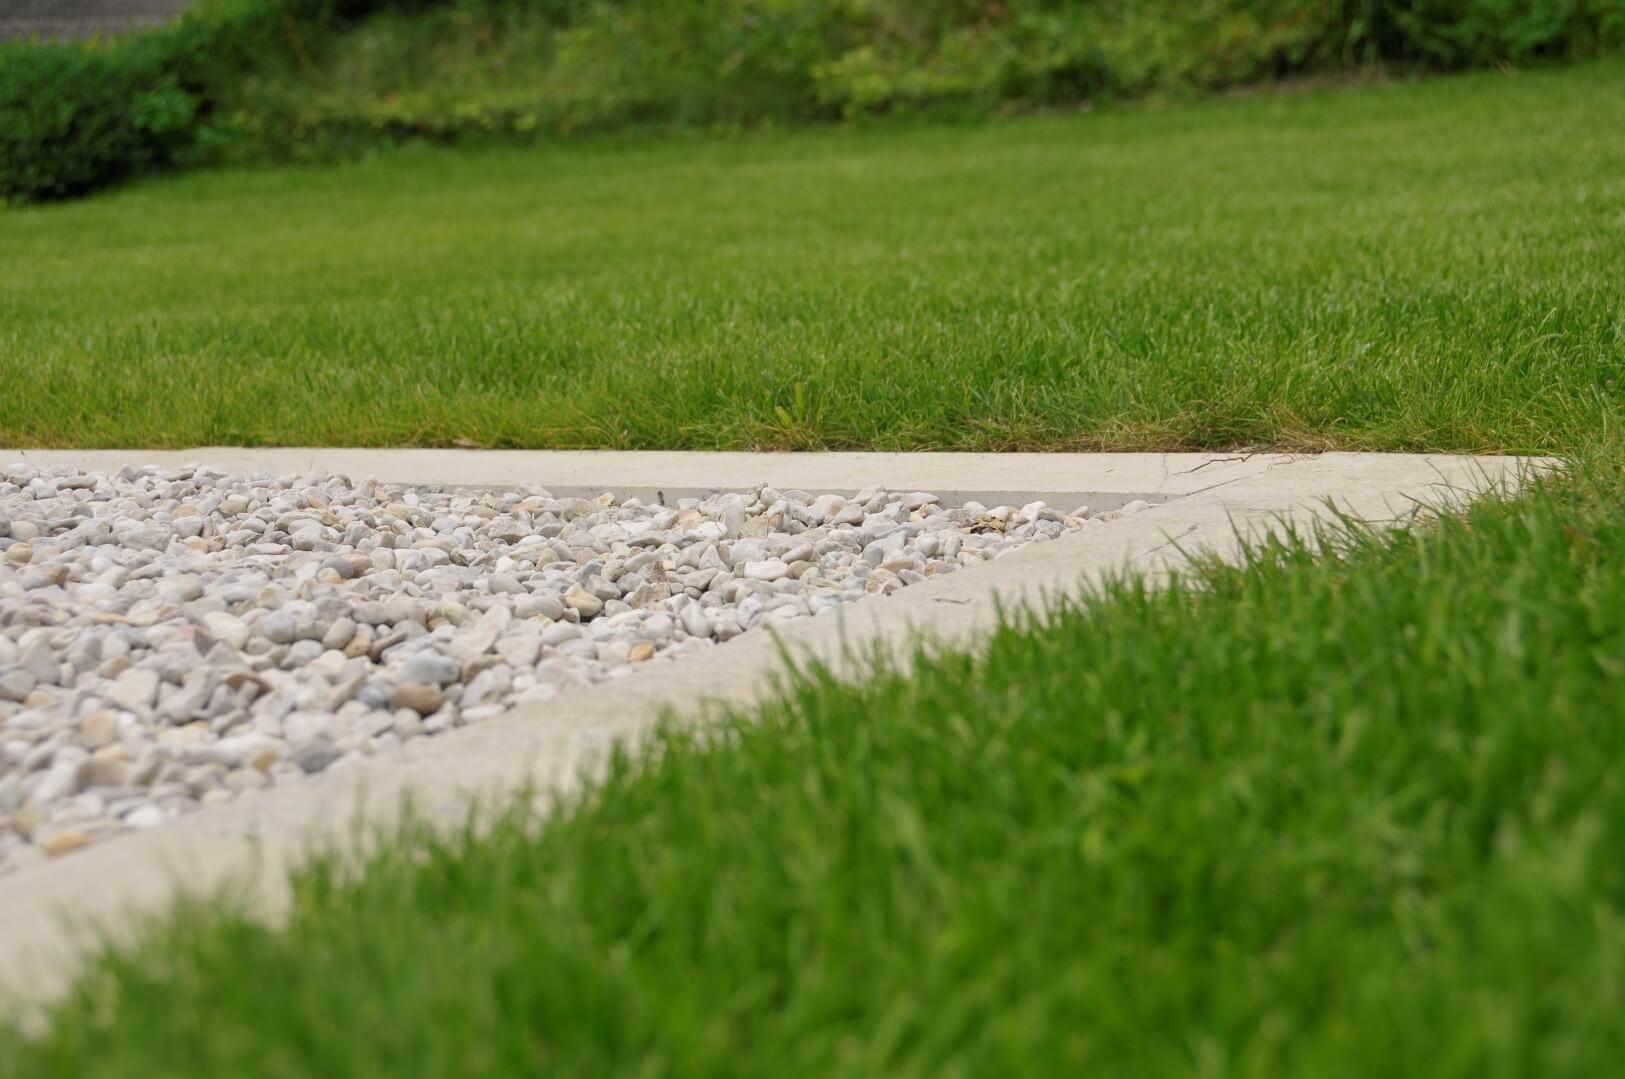 paysagiste tramelan villa terrasse jardin mur en pierres calcaires aellig paysages (1)